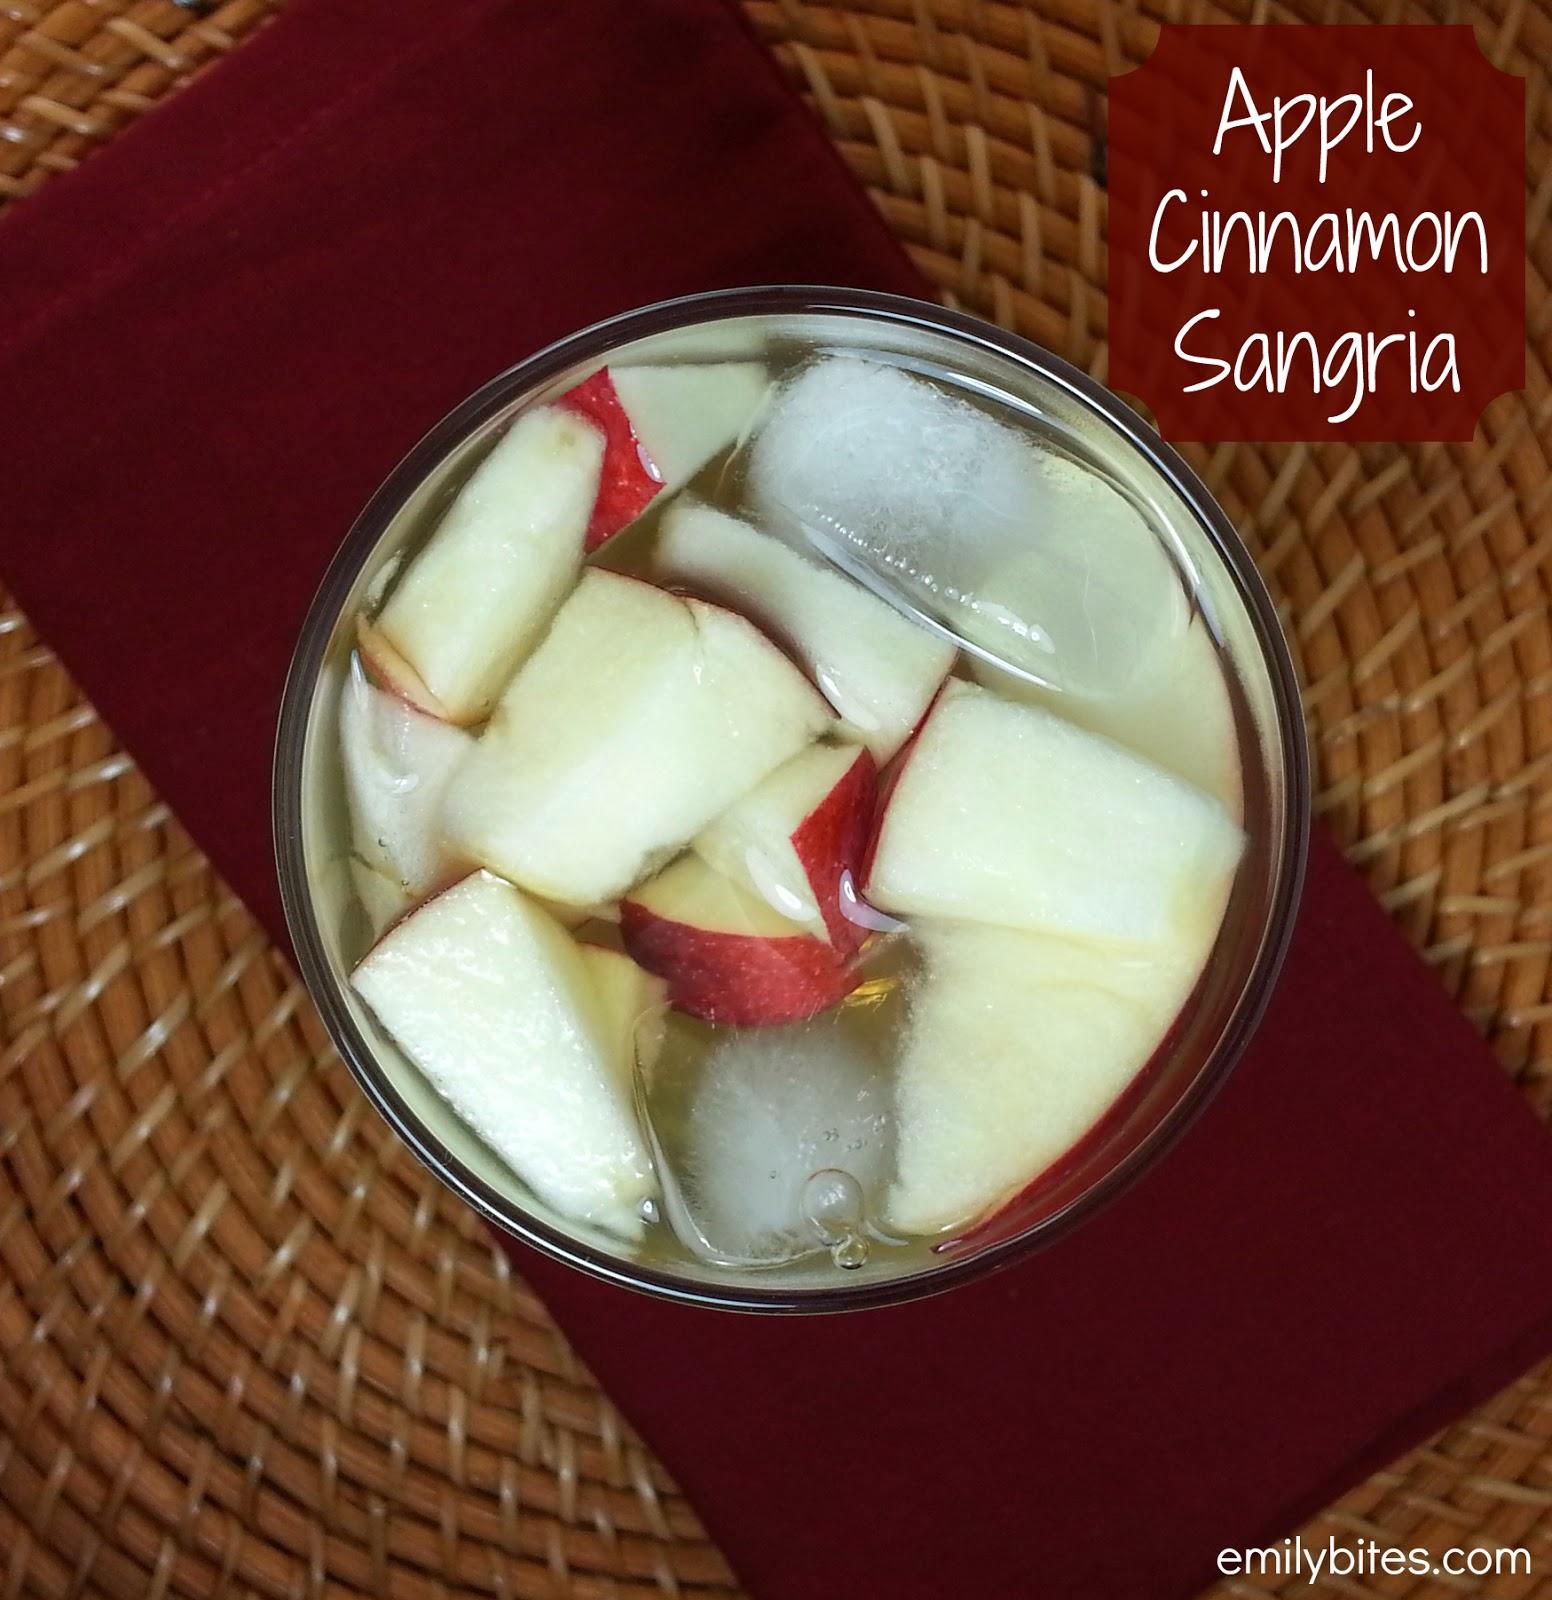 Apple Cinnamon Sangria - Emily Bites